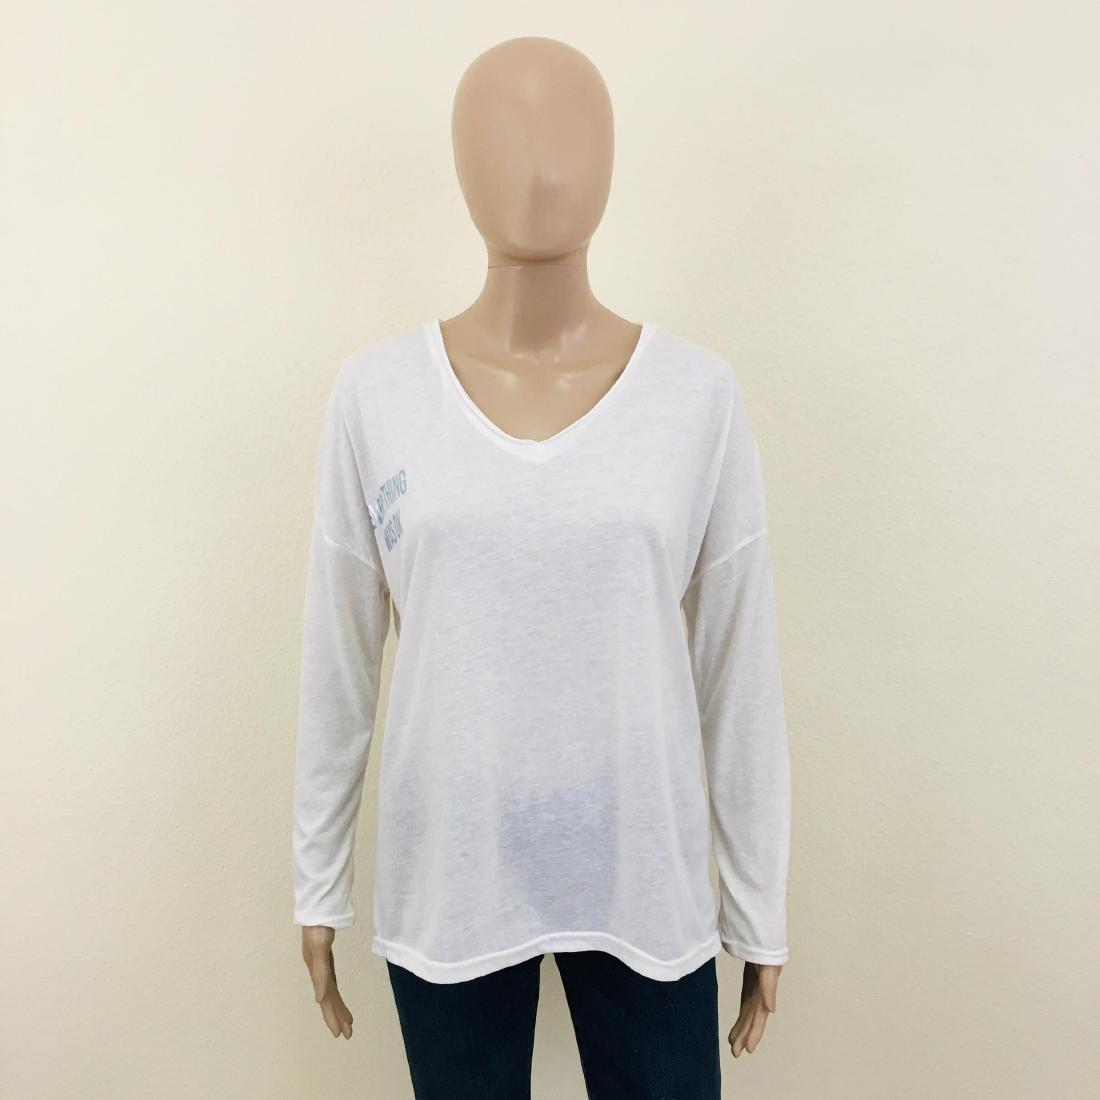 New Women's ZARA Oversized Top Blouse Size M